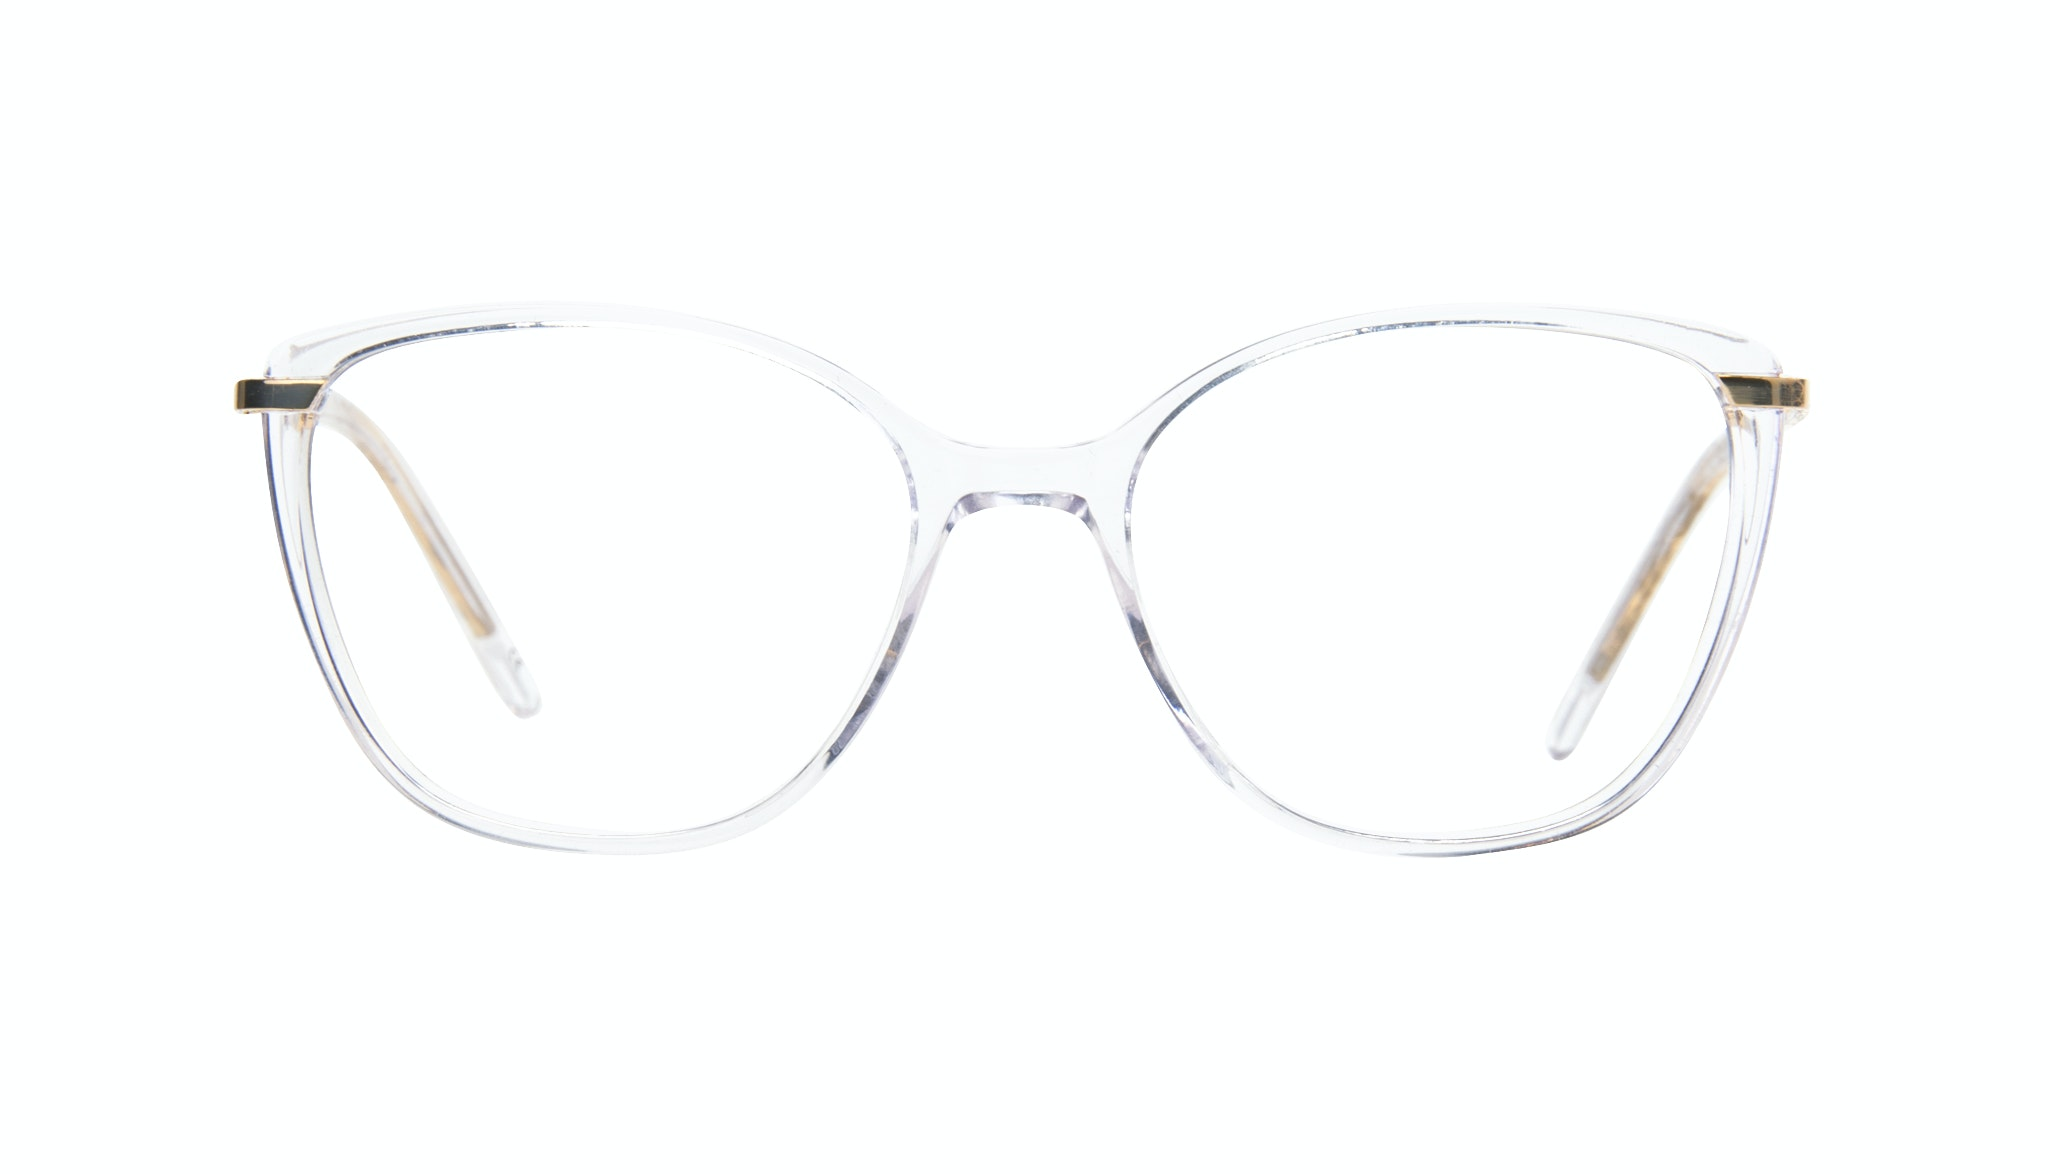 Affordable Fashion Glasses Cat Eye Rectangle Square Eyeglasses Women Illusion Gold Diamond